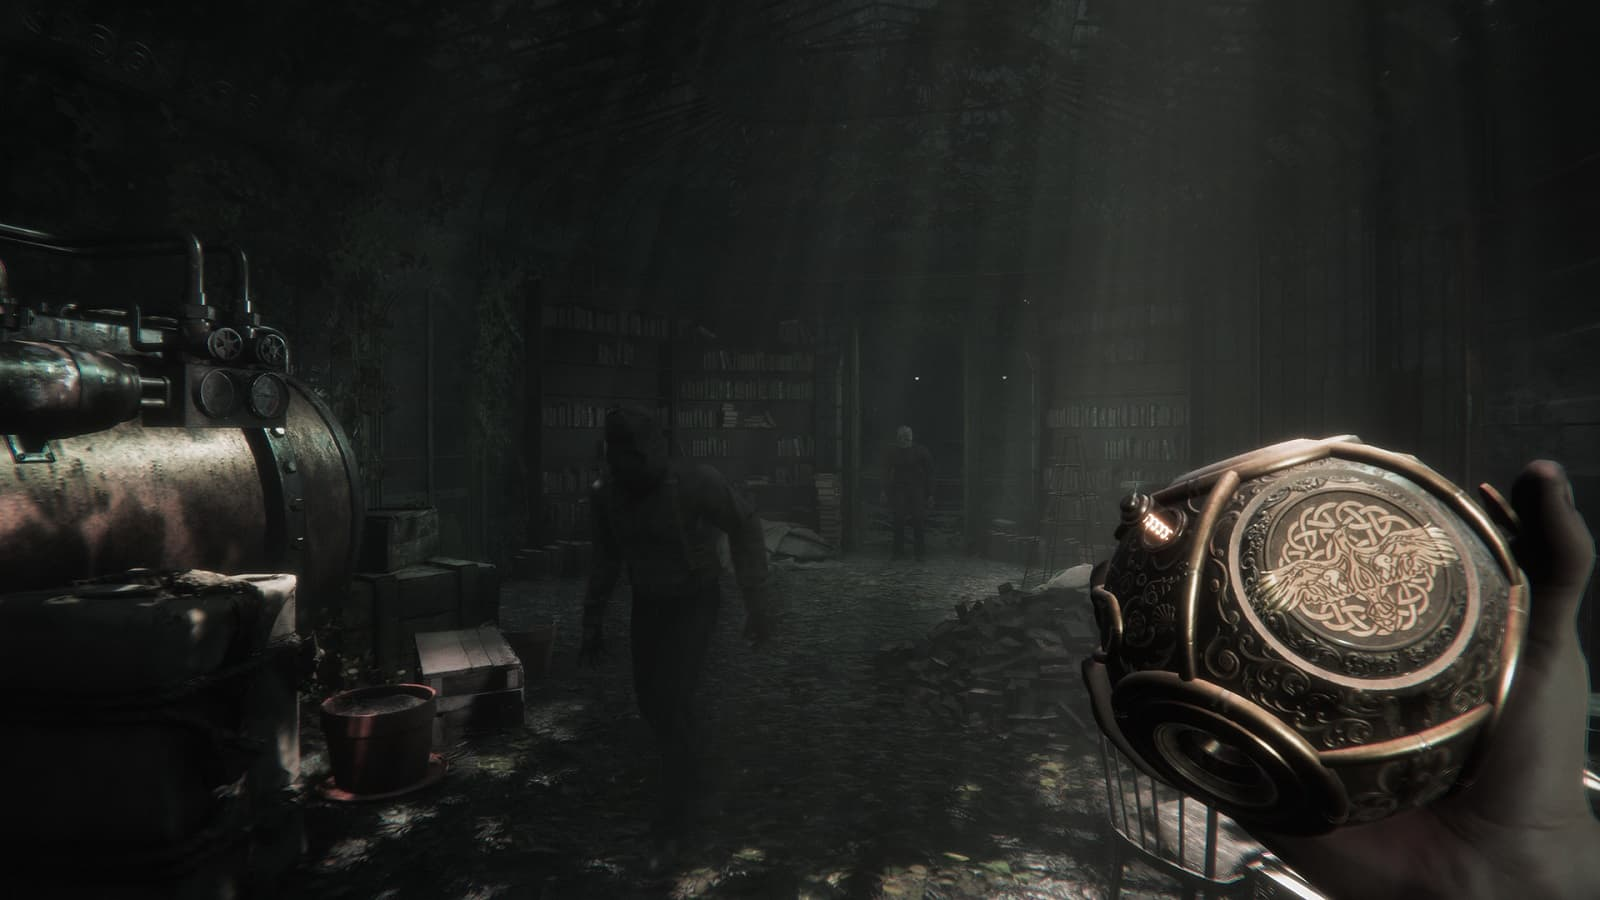 Рецензия на игру Maid of Sker - готический клон ремейка Resident Evil 2 с примесью Amnesia - 02